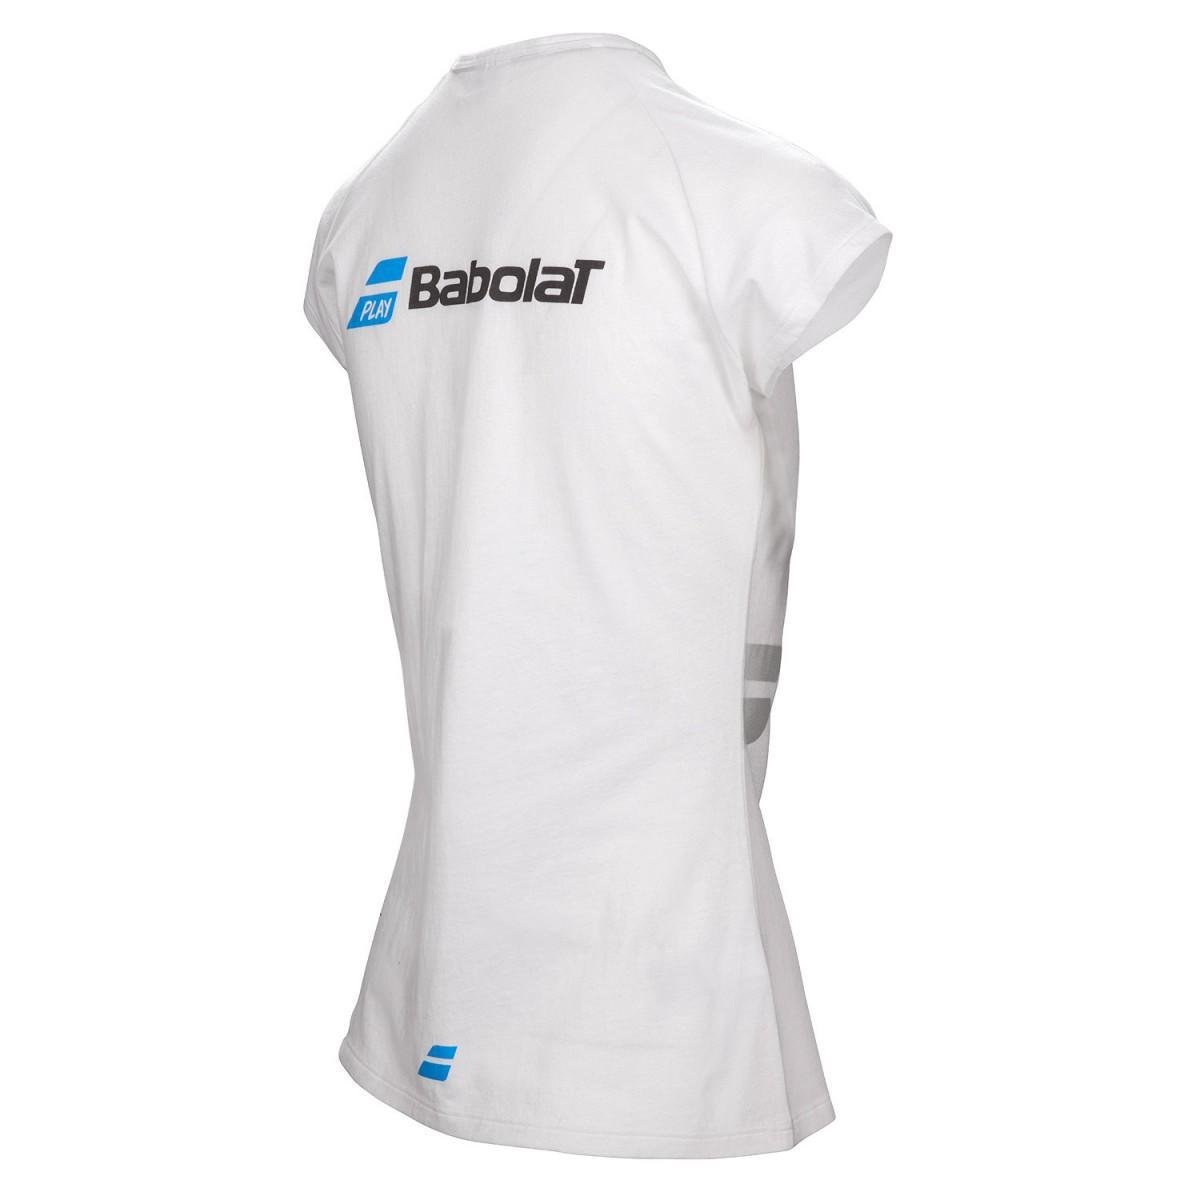 Теннисная футболка детская Babolat Core Tee Girl white